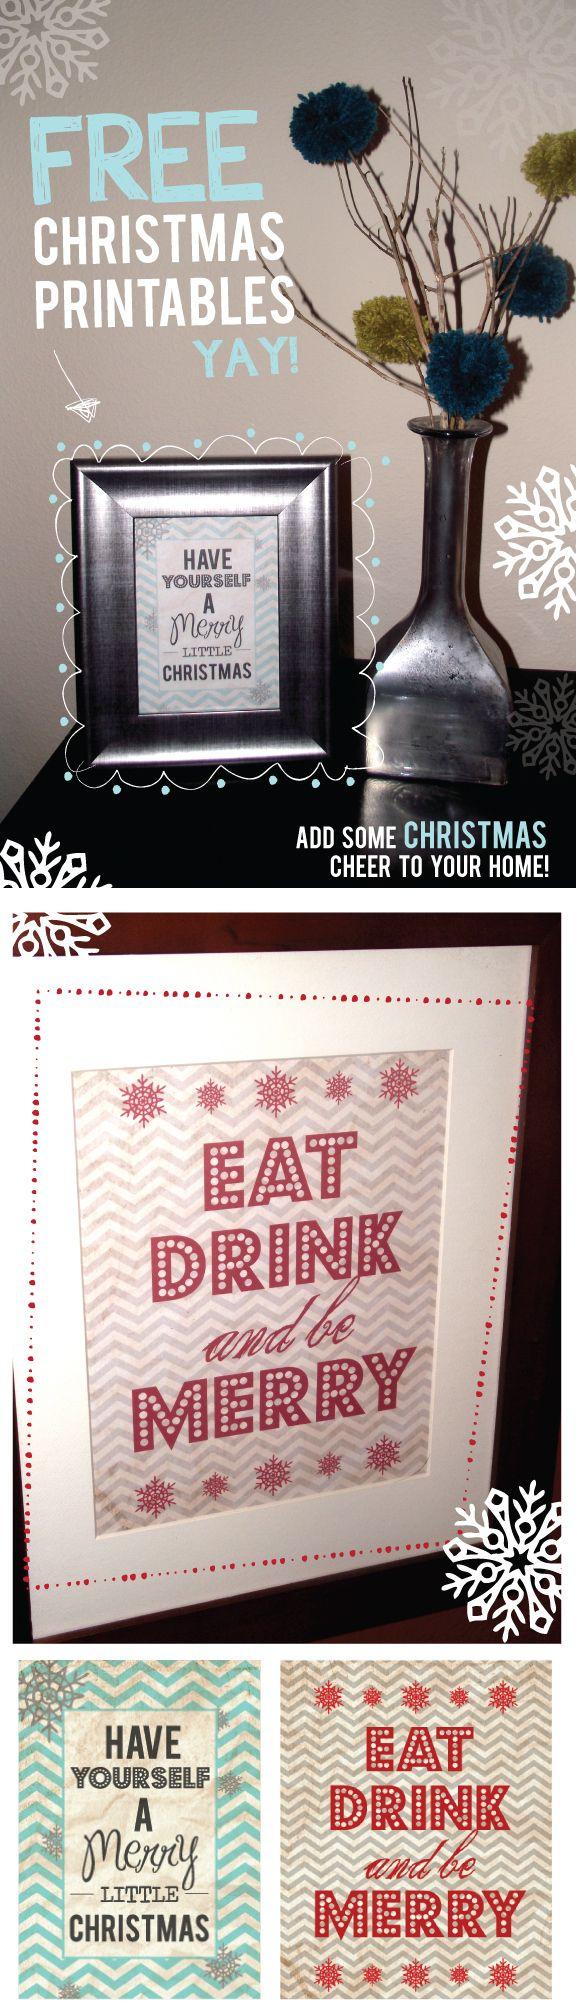 FREE Christmas Printables! | Made with Love